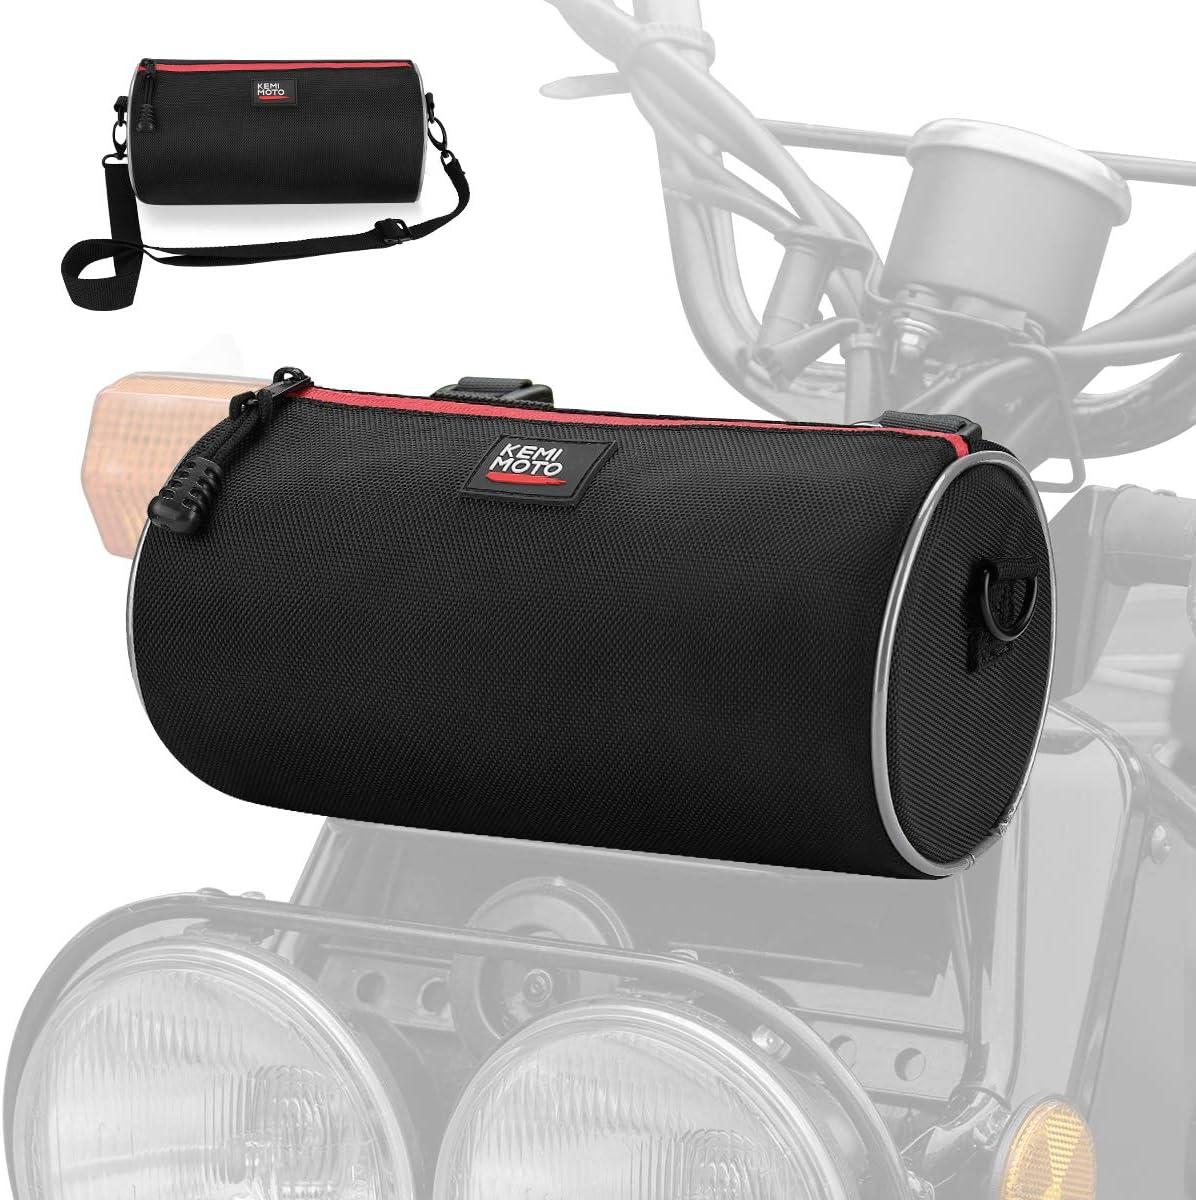 Black Motorcycle Fork Tool Barrel Bag with Shoulder Straps Water Resistant Front Frame Tank Bag Large Capacity Kemimoto Universal Motorcycle Handlebar Bag